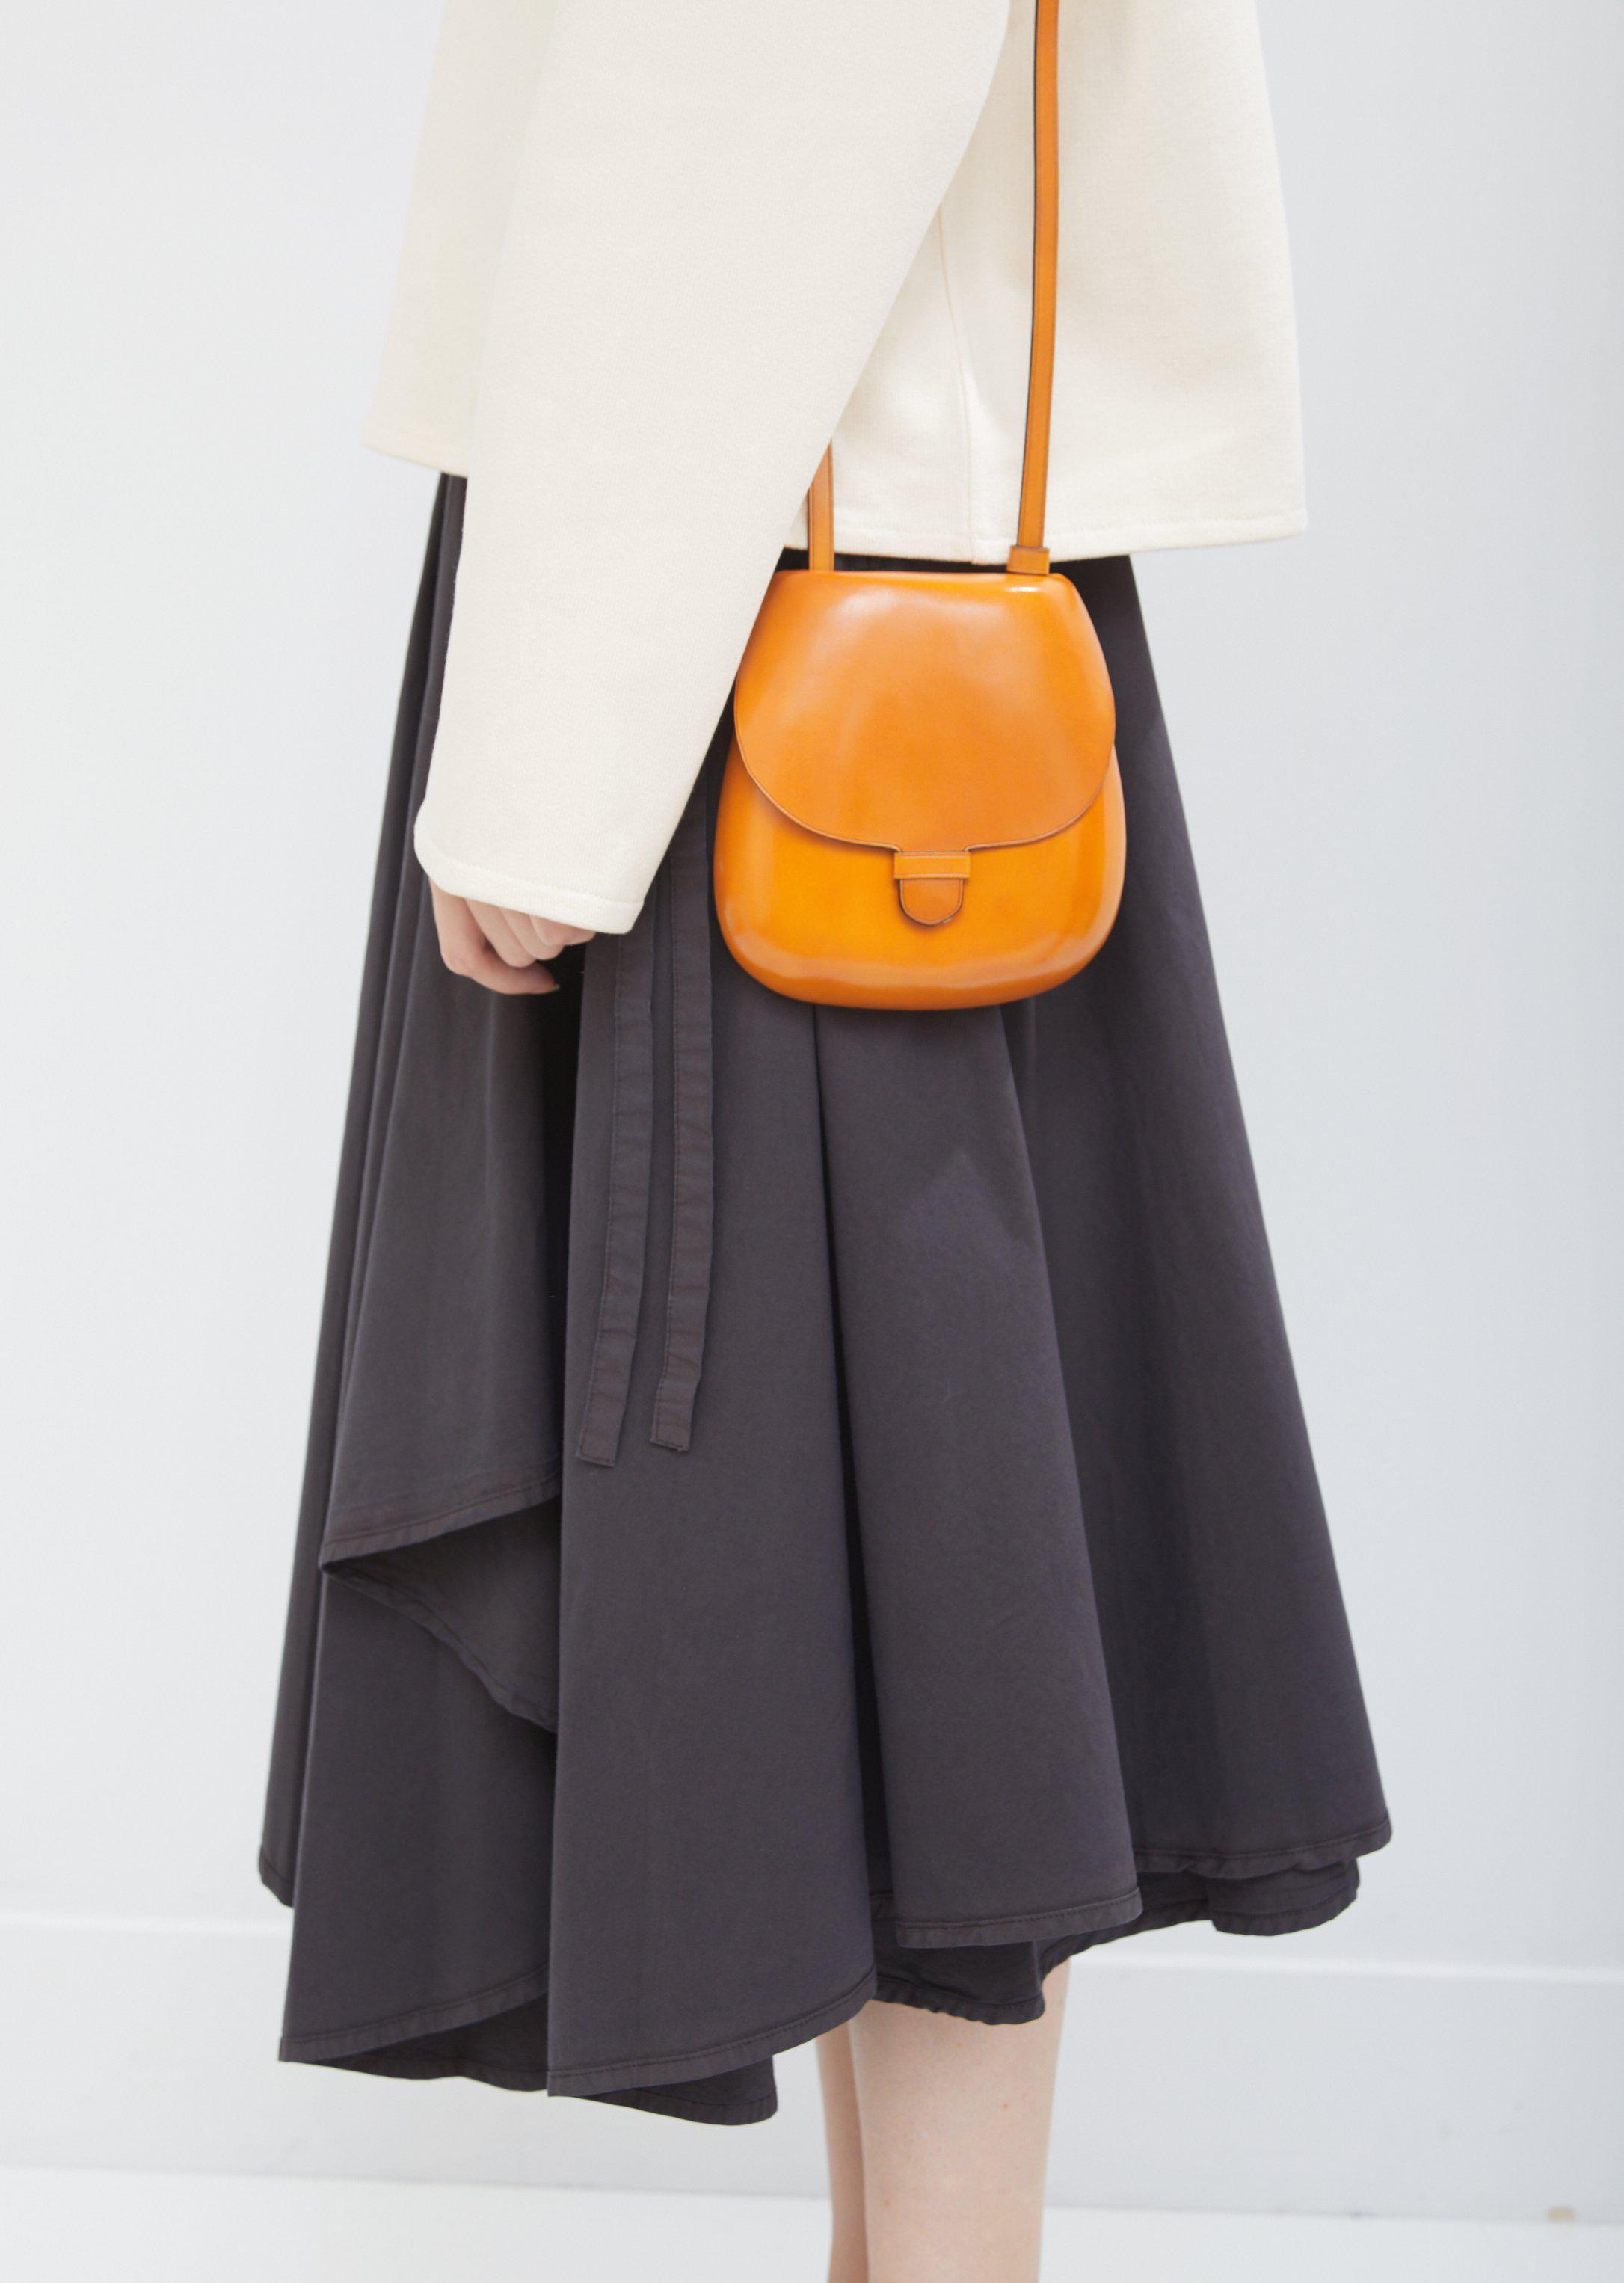 Lyst - Lemaire Cartridge Bag in Orange